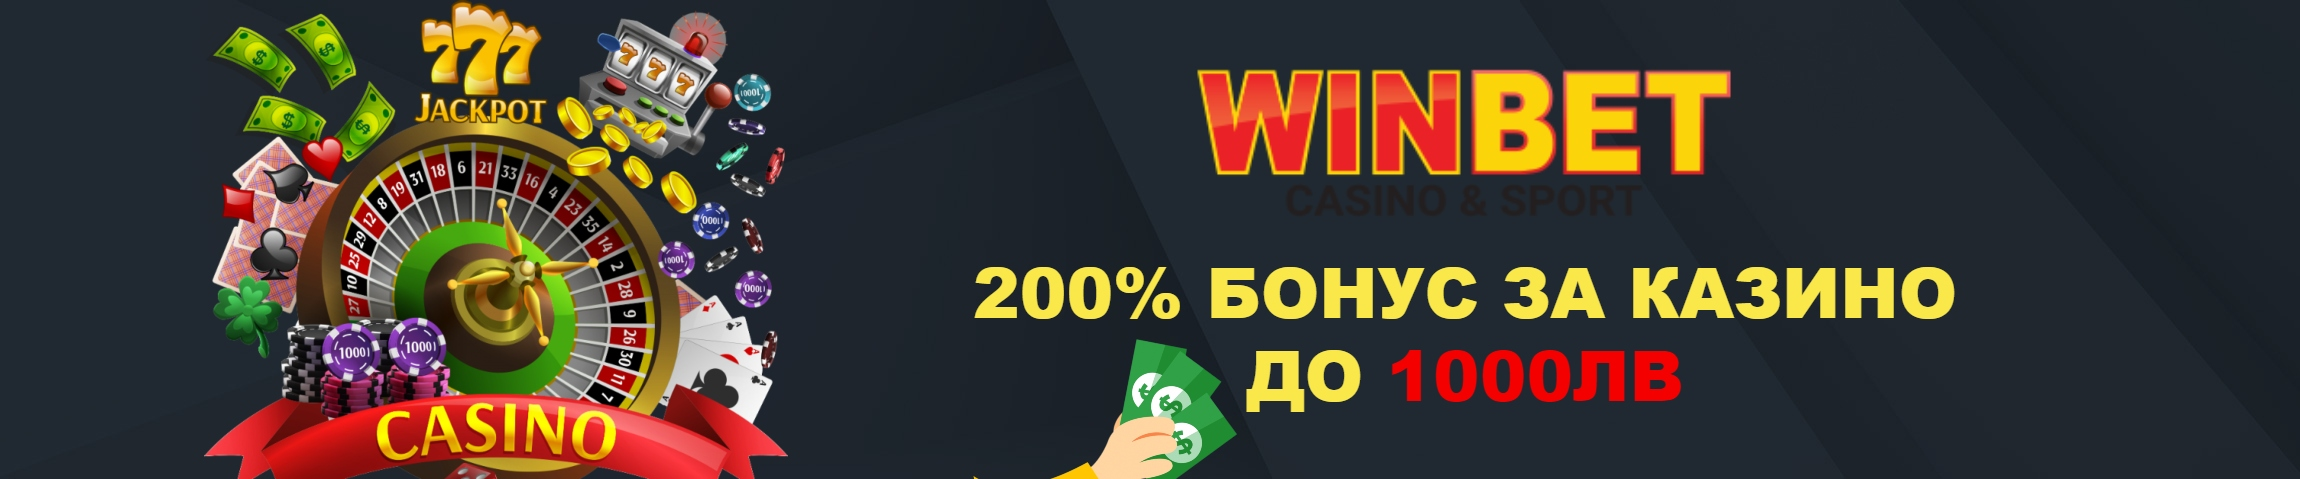 Winbet бонус регистрация